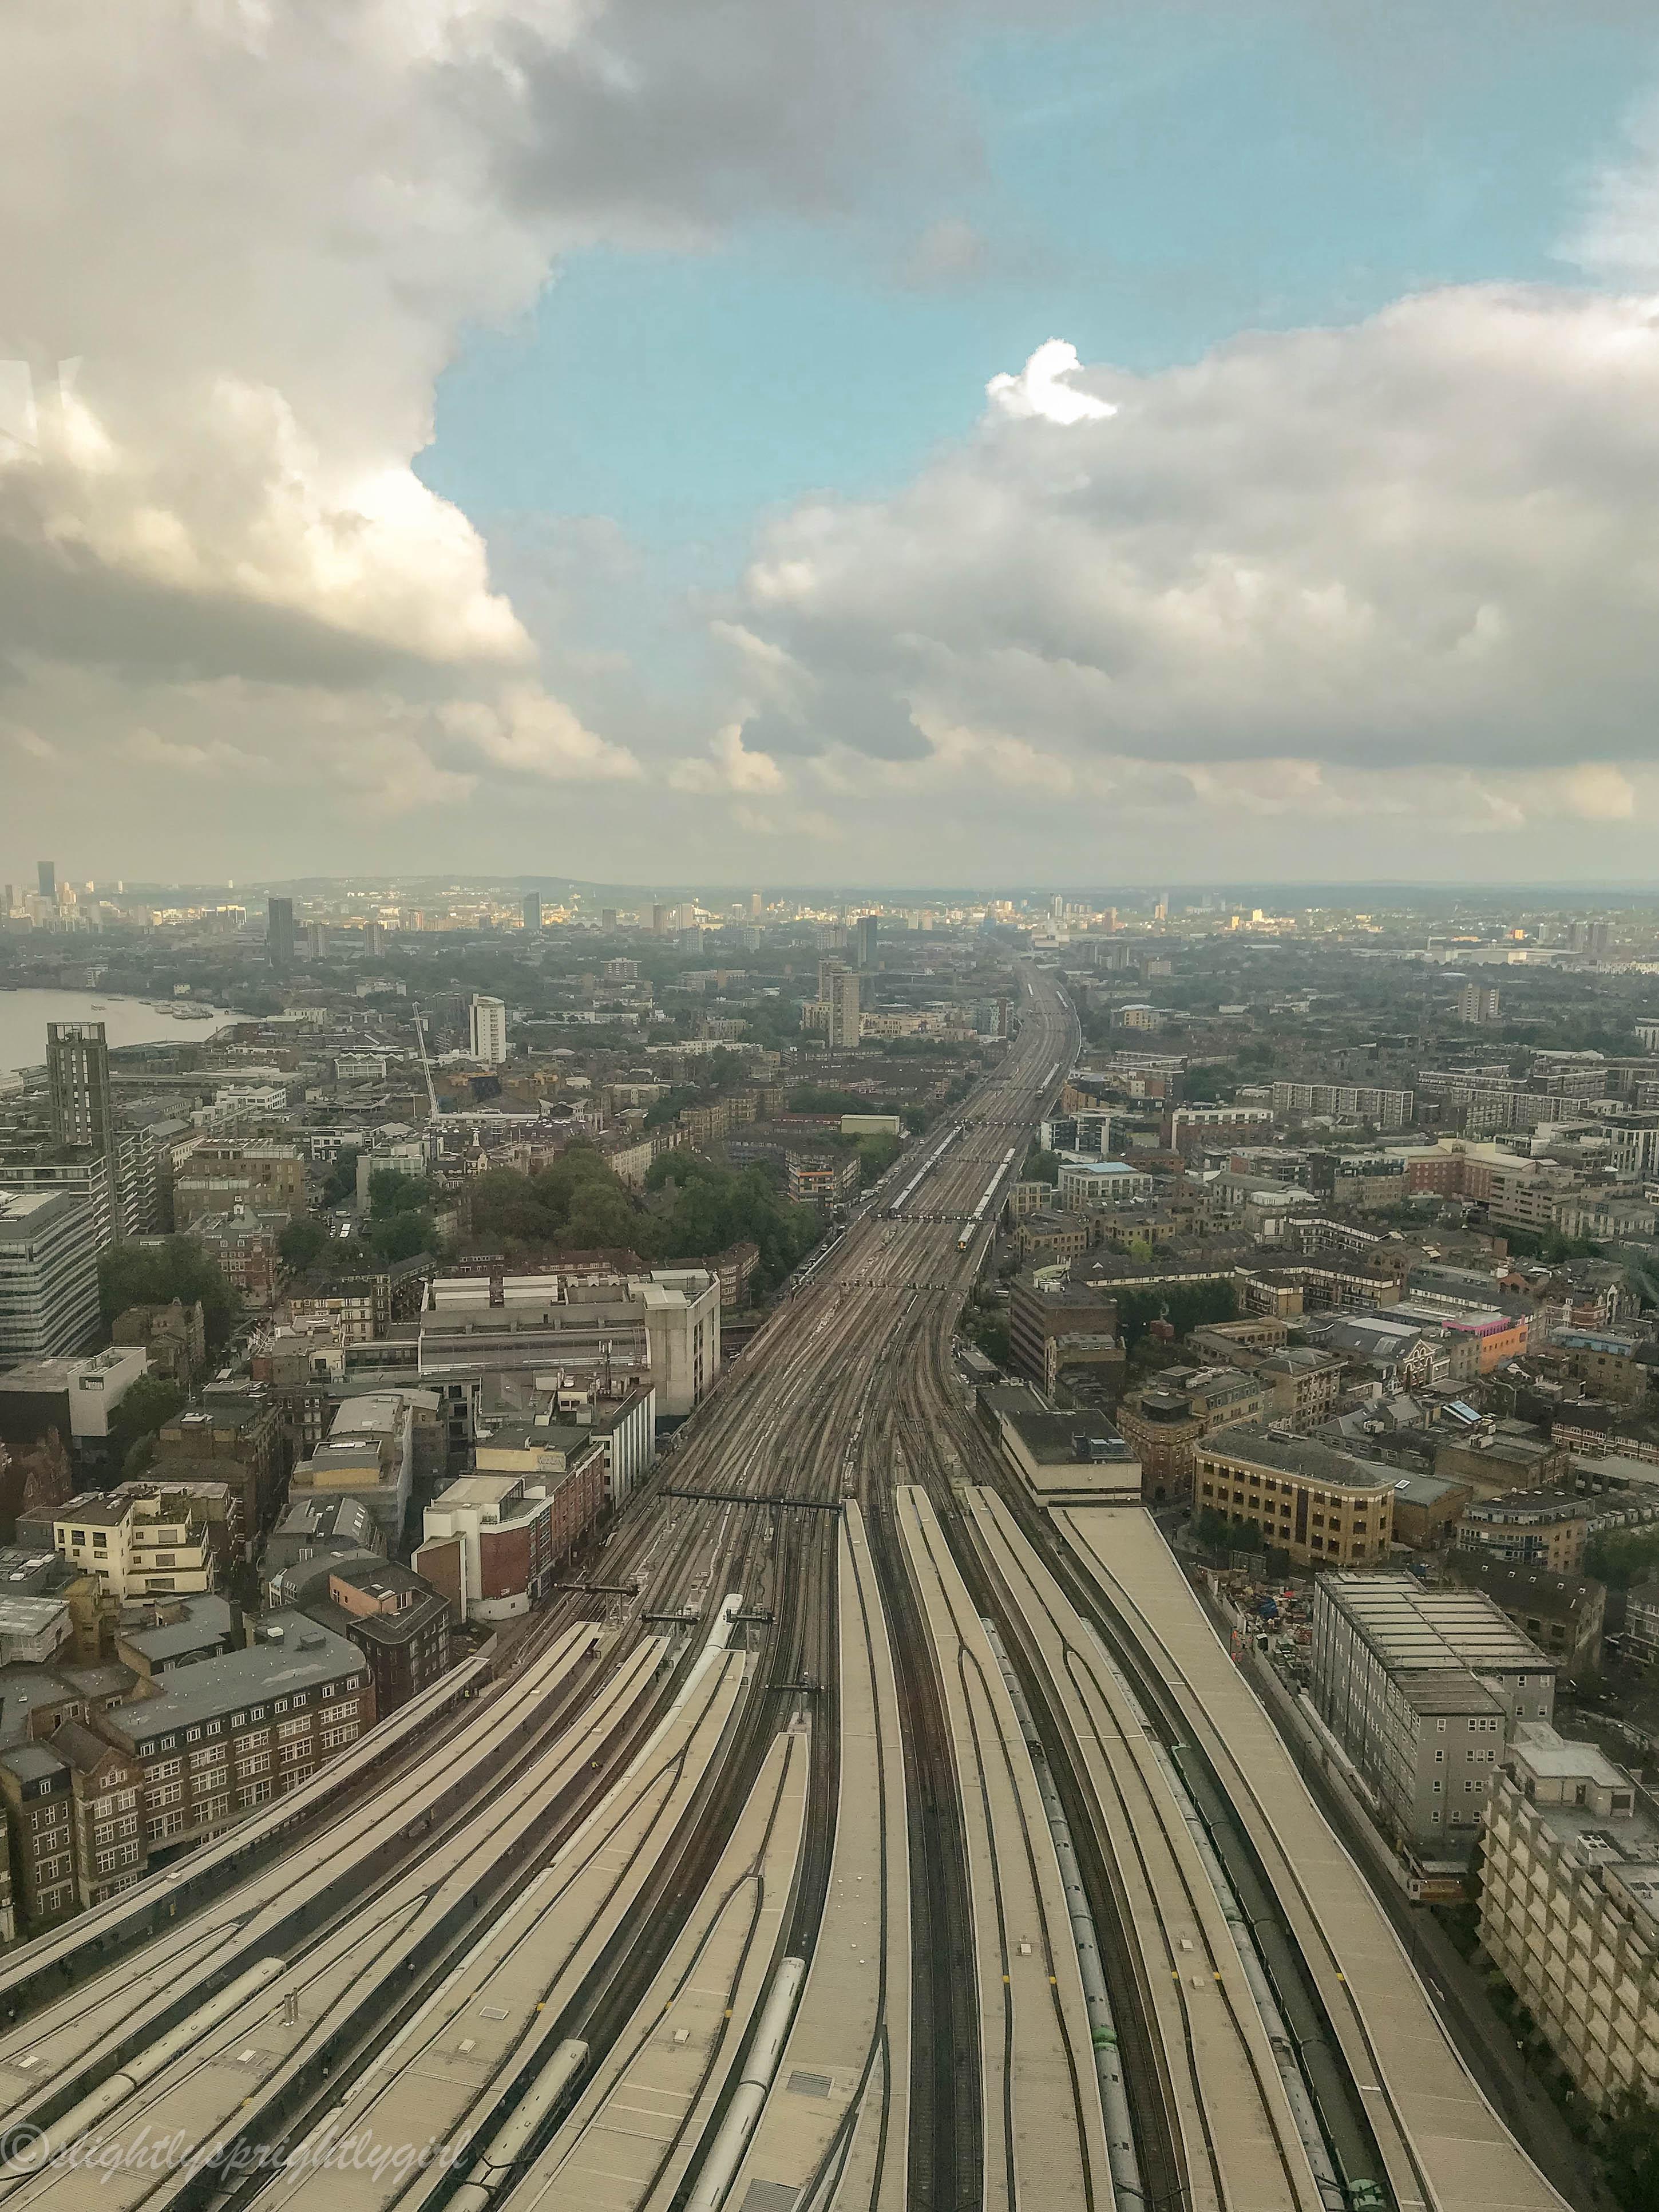 Tube network, London